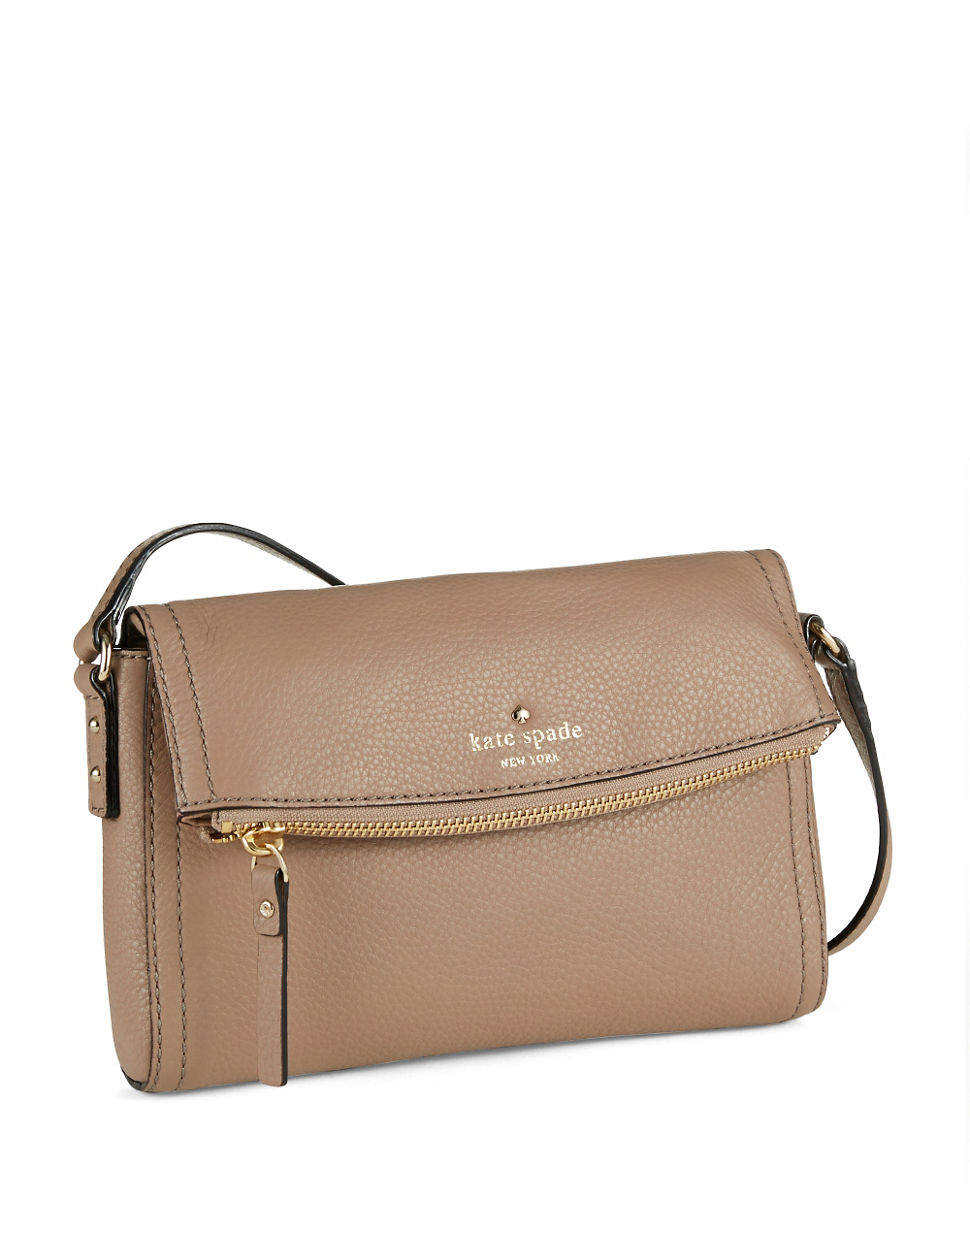 huge discount enjoy big discount great quality Kate Spade Mini Carson Crossbody Bag in Brown - Lyst